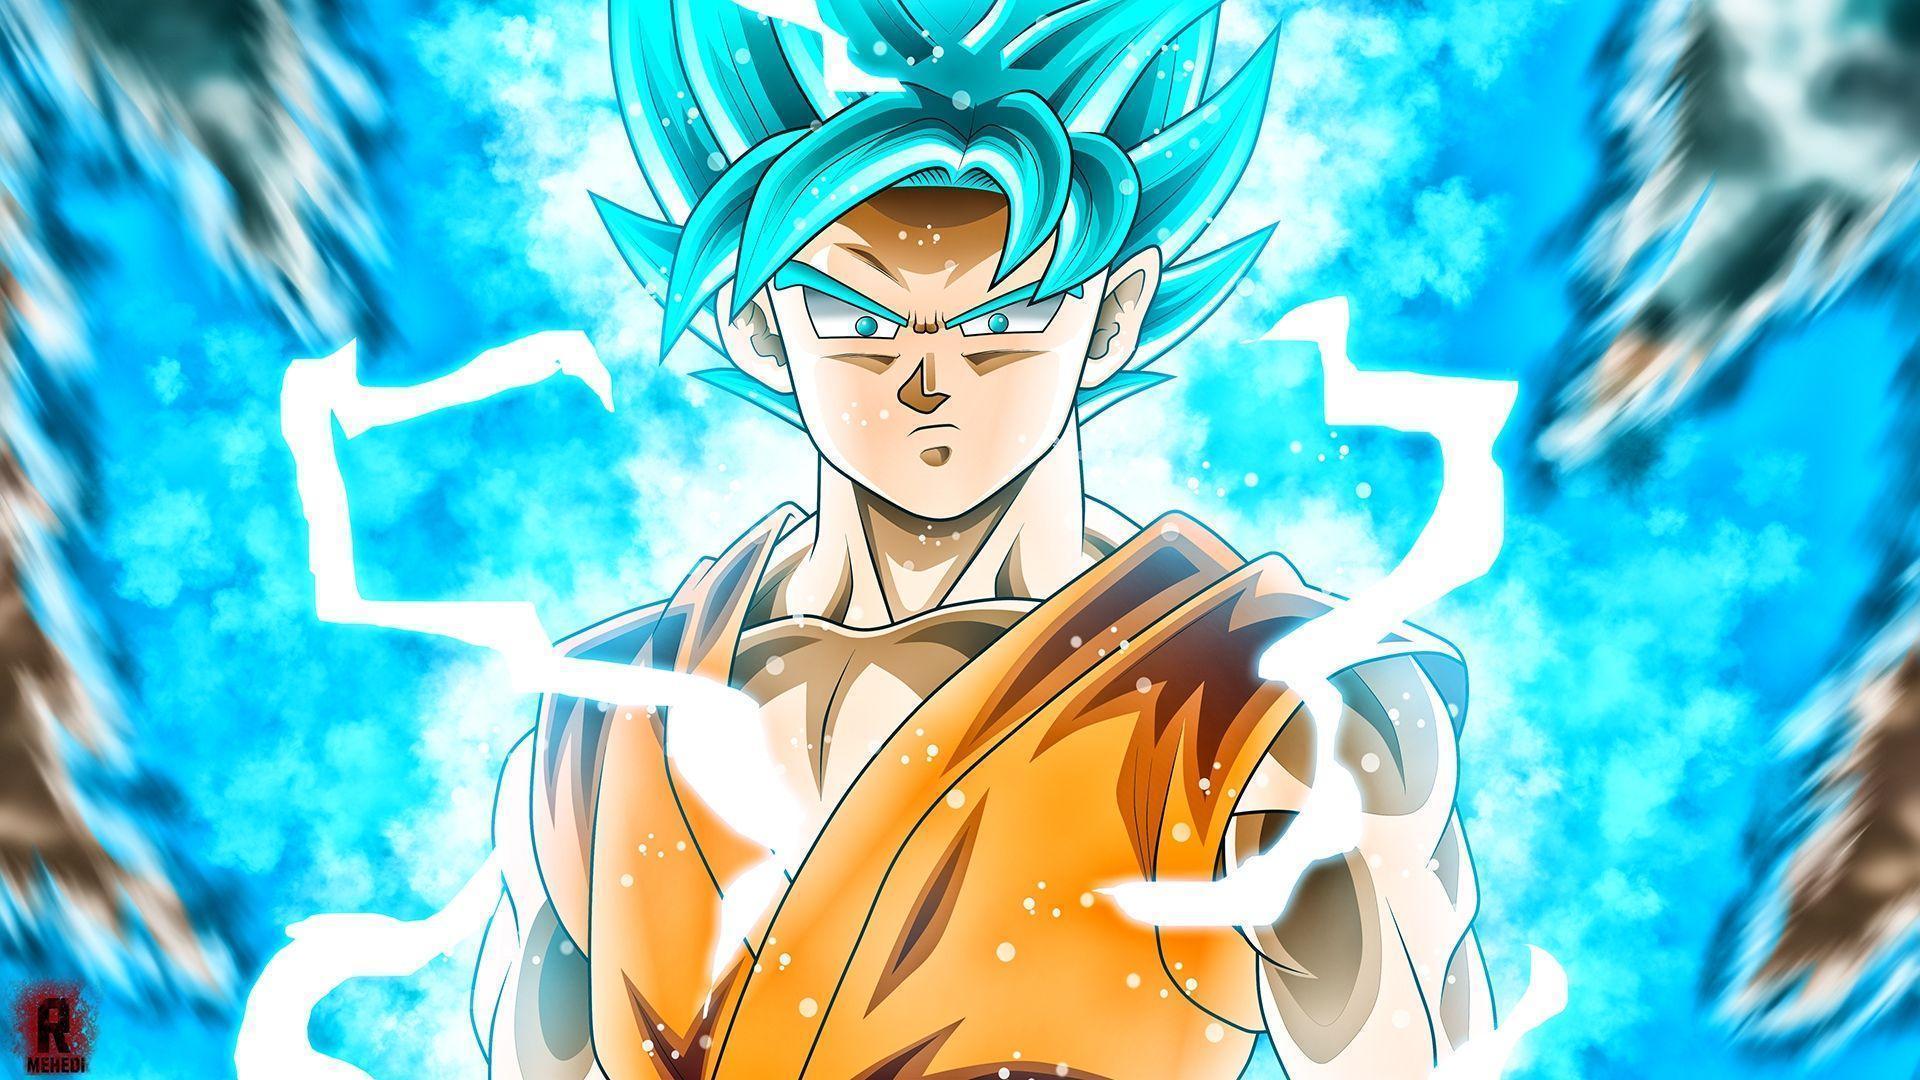 Goku super saiyan blue wallpapers wallpaper cave - Super saiyan live wallpaper ...